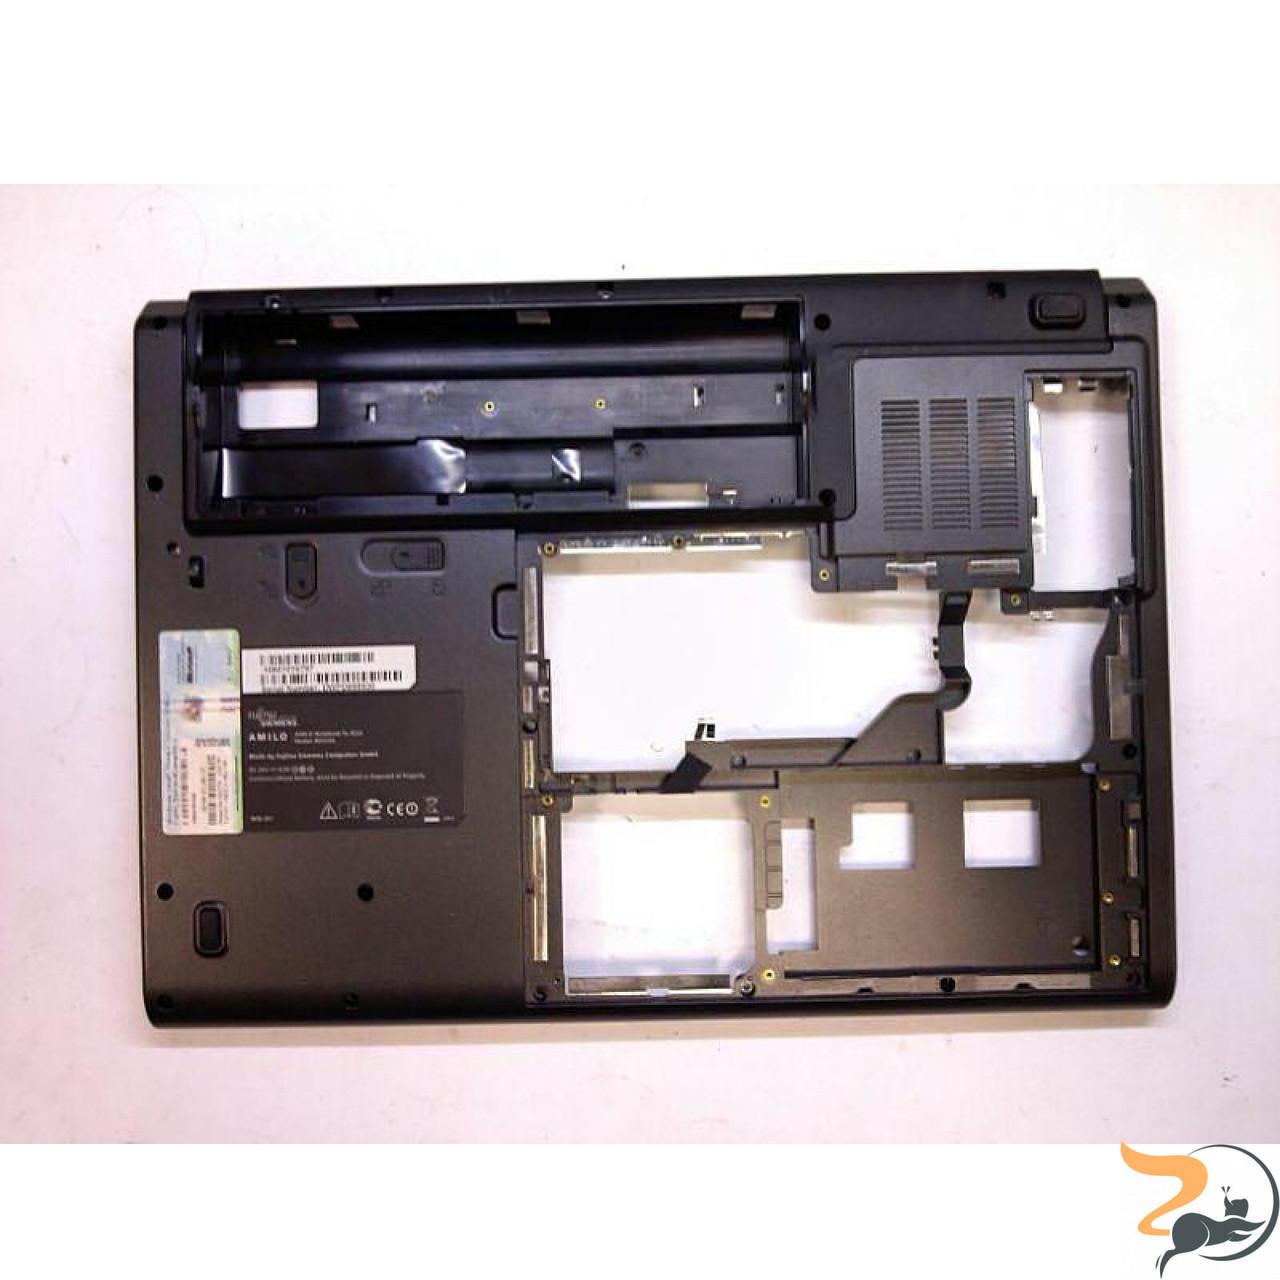 Нижня частина для ноутбука Fujitsu Siemens Amilo Pa3553, 60.4H703.023, Б/В.